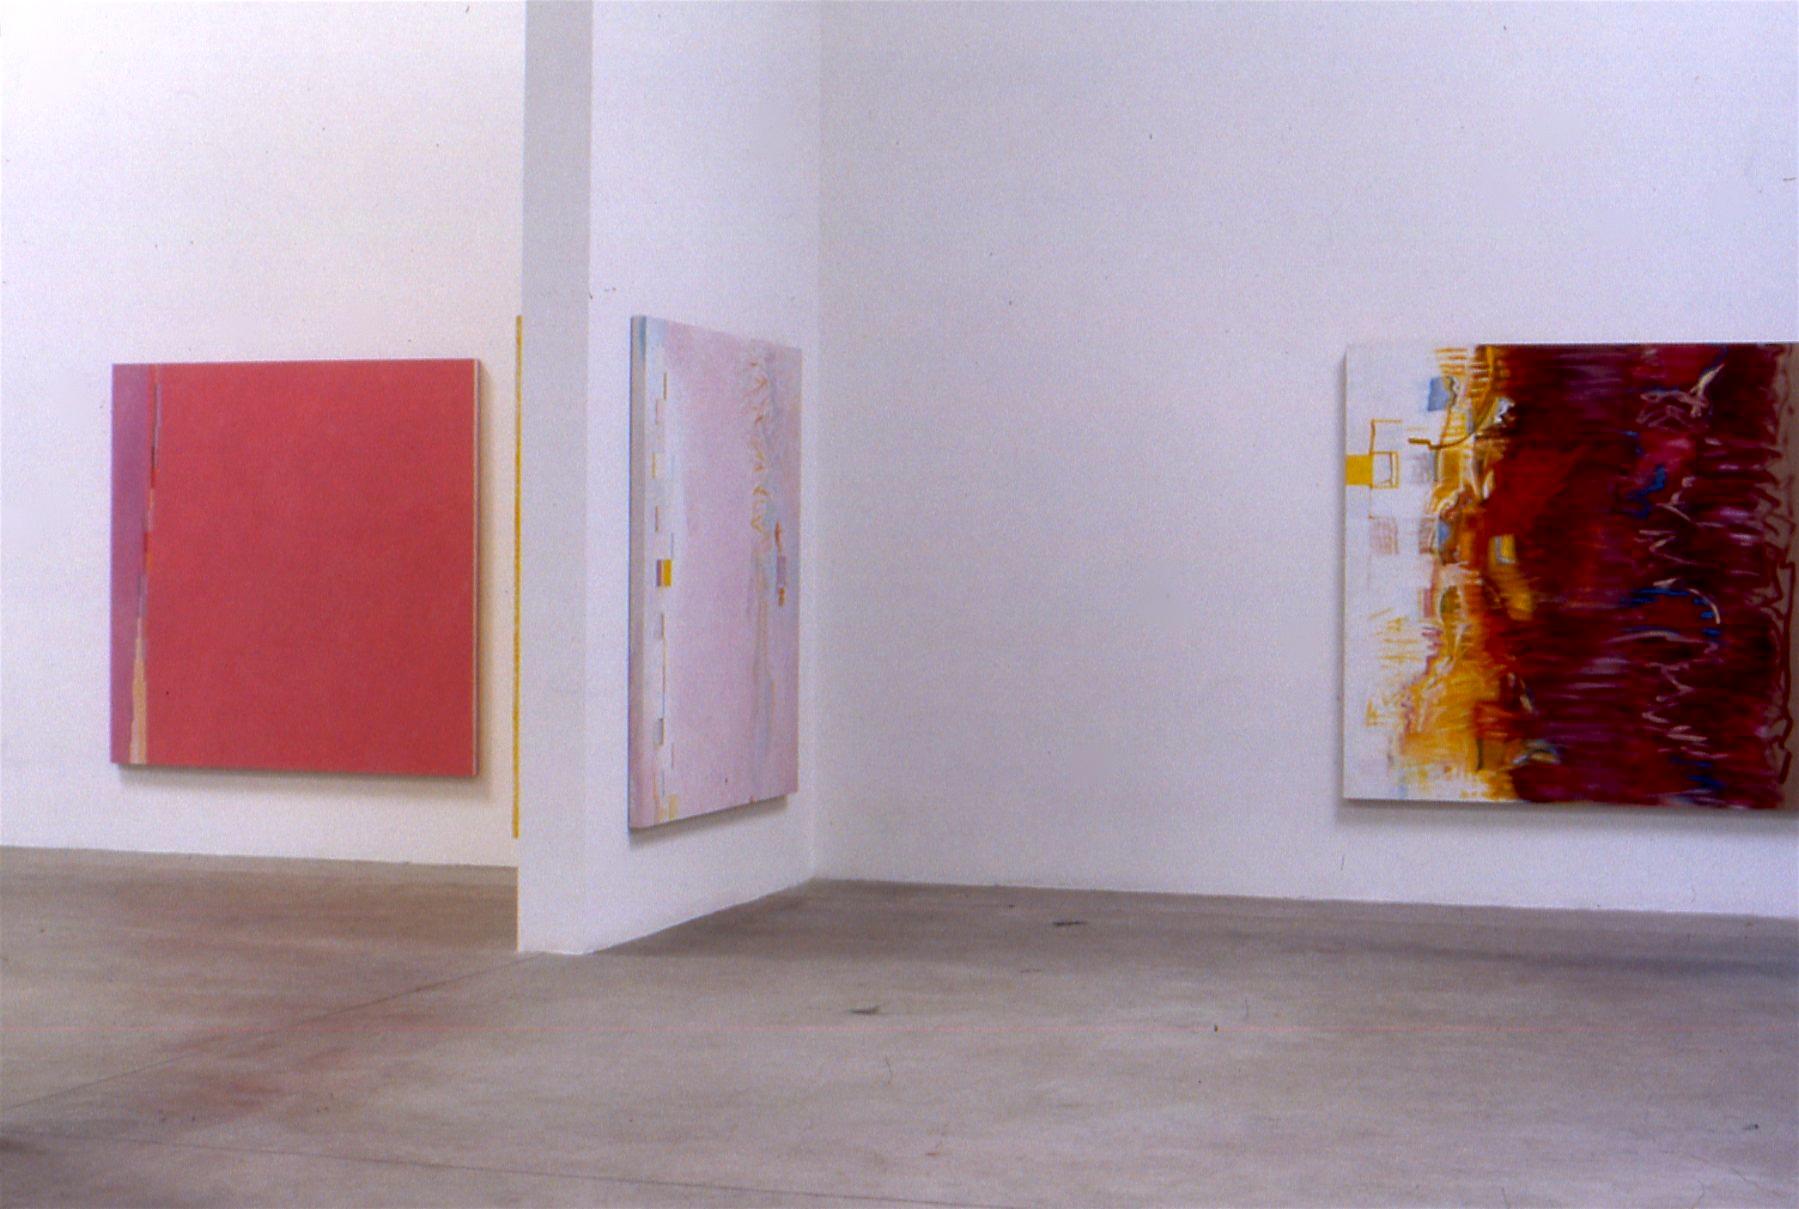 2004: Jeremy Gilbert-Rolfe at Frank Gehry Associates, Santa Monica, CA